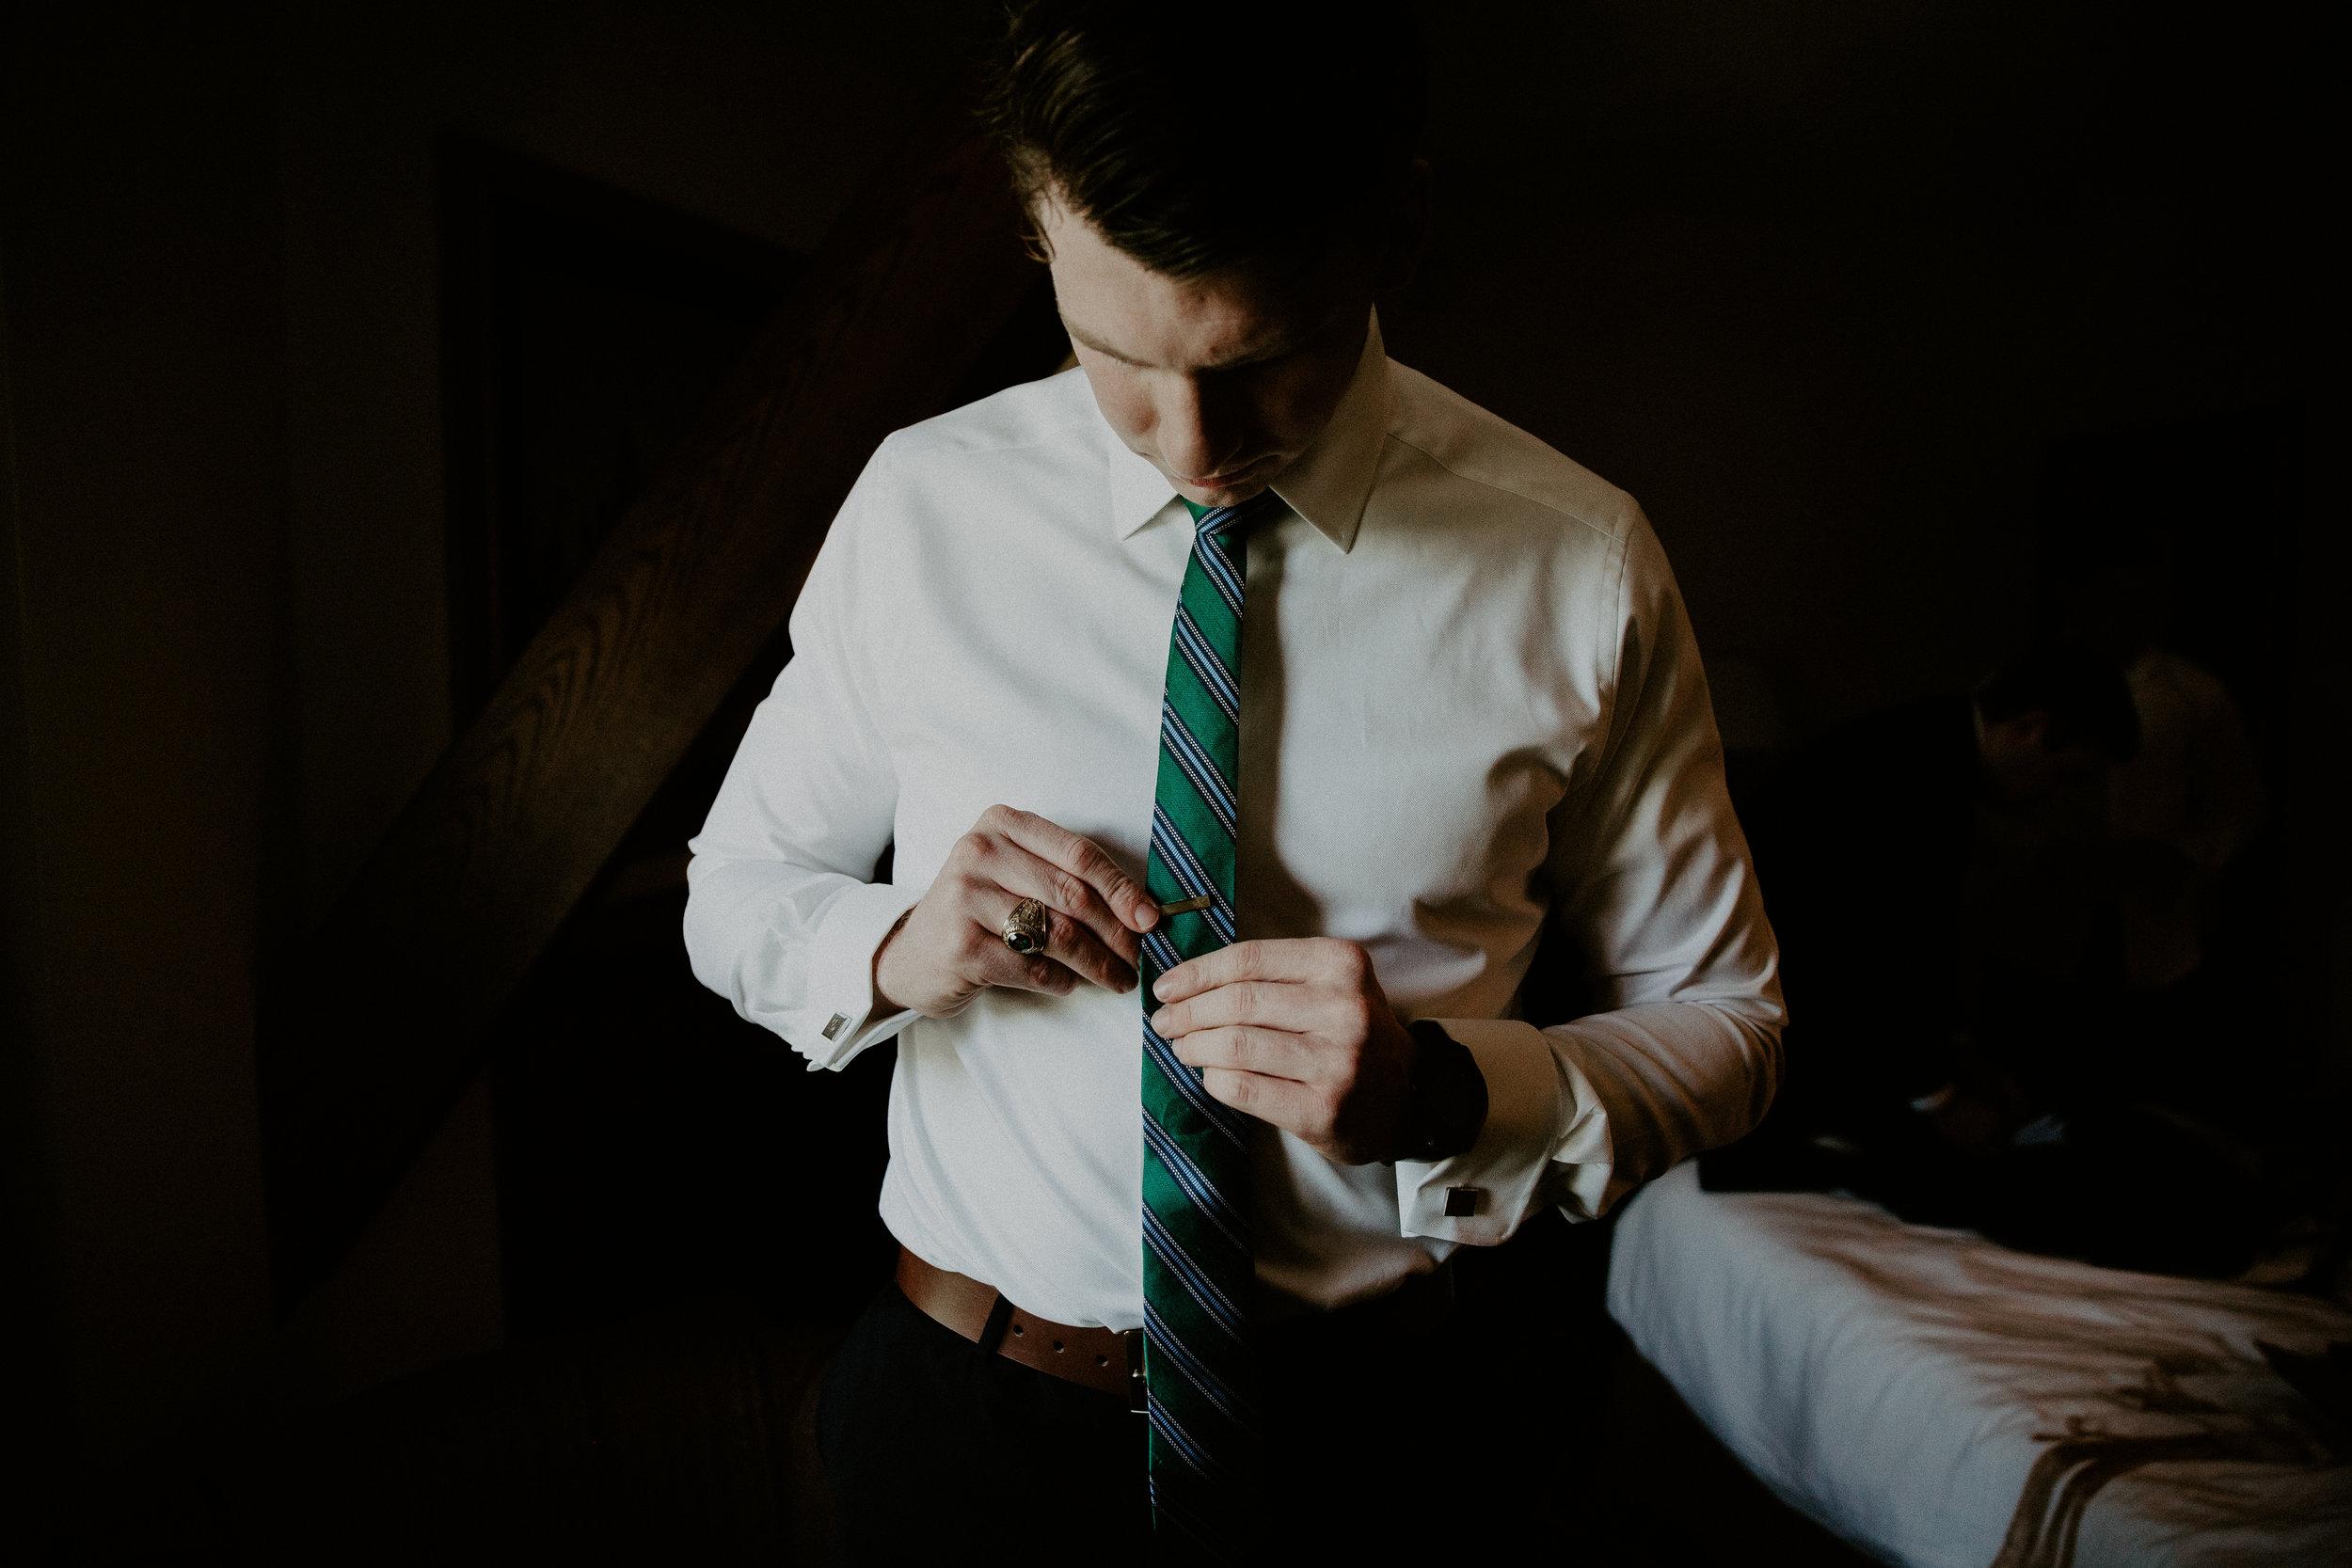 Mariemont_Chapel_Cincinnati_Wedding_Hannah_Nick-EDIT-79.JPG